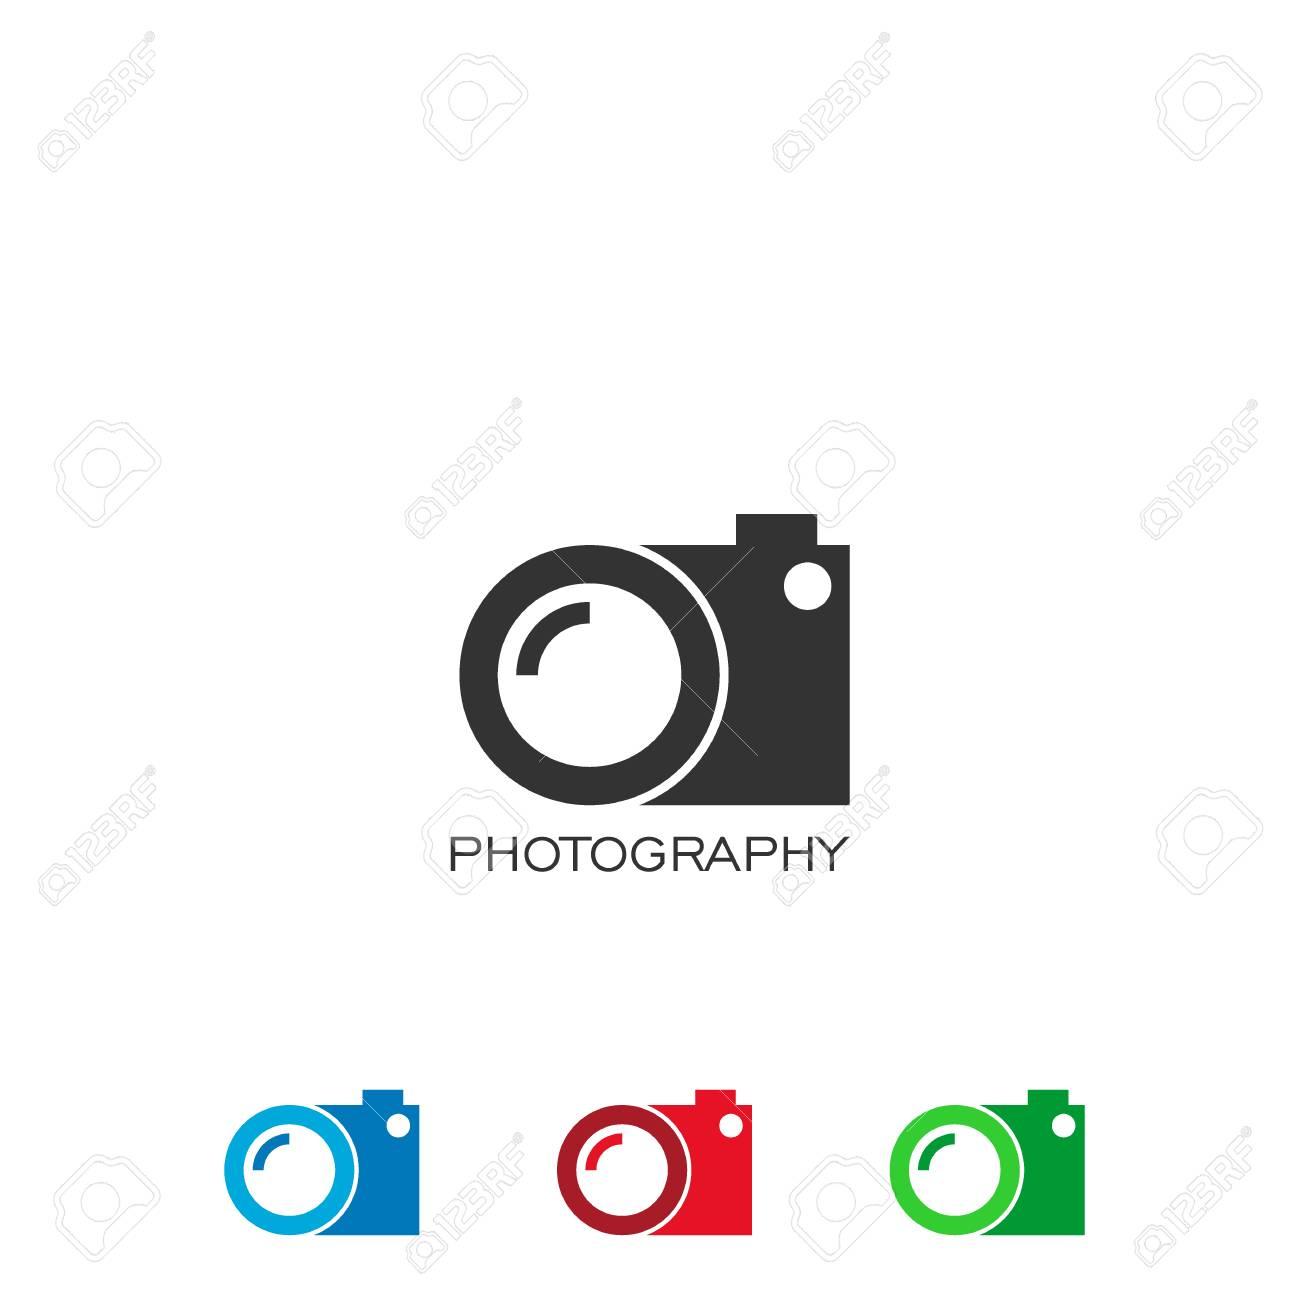 Photography Logo Camera Logo Design Lens Logo Royalty Free Cliparts Vectors And Stock Illustration Image 115437994